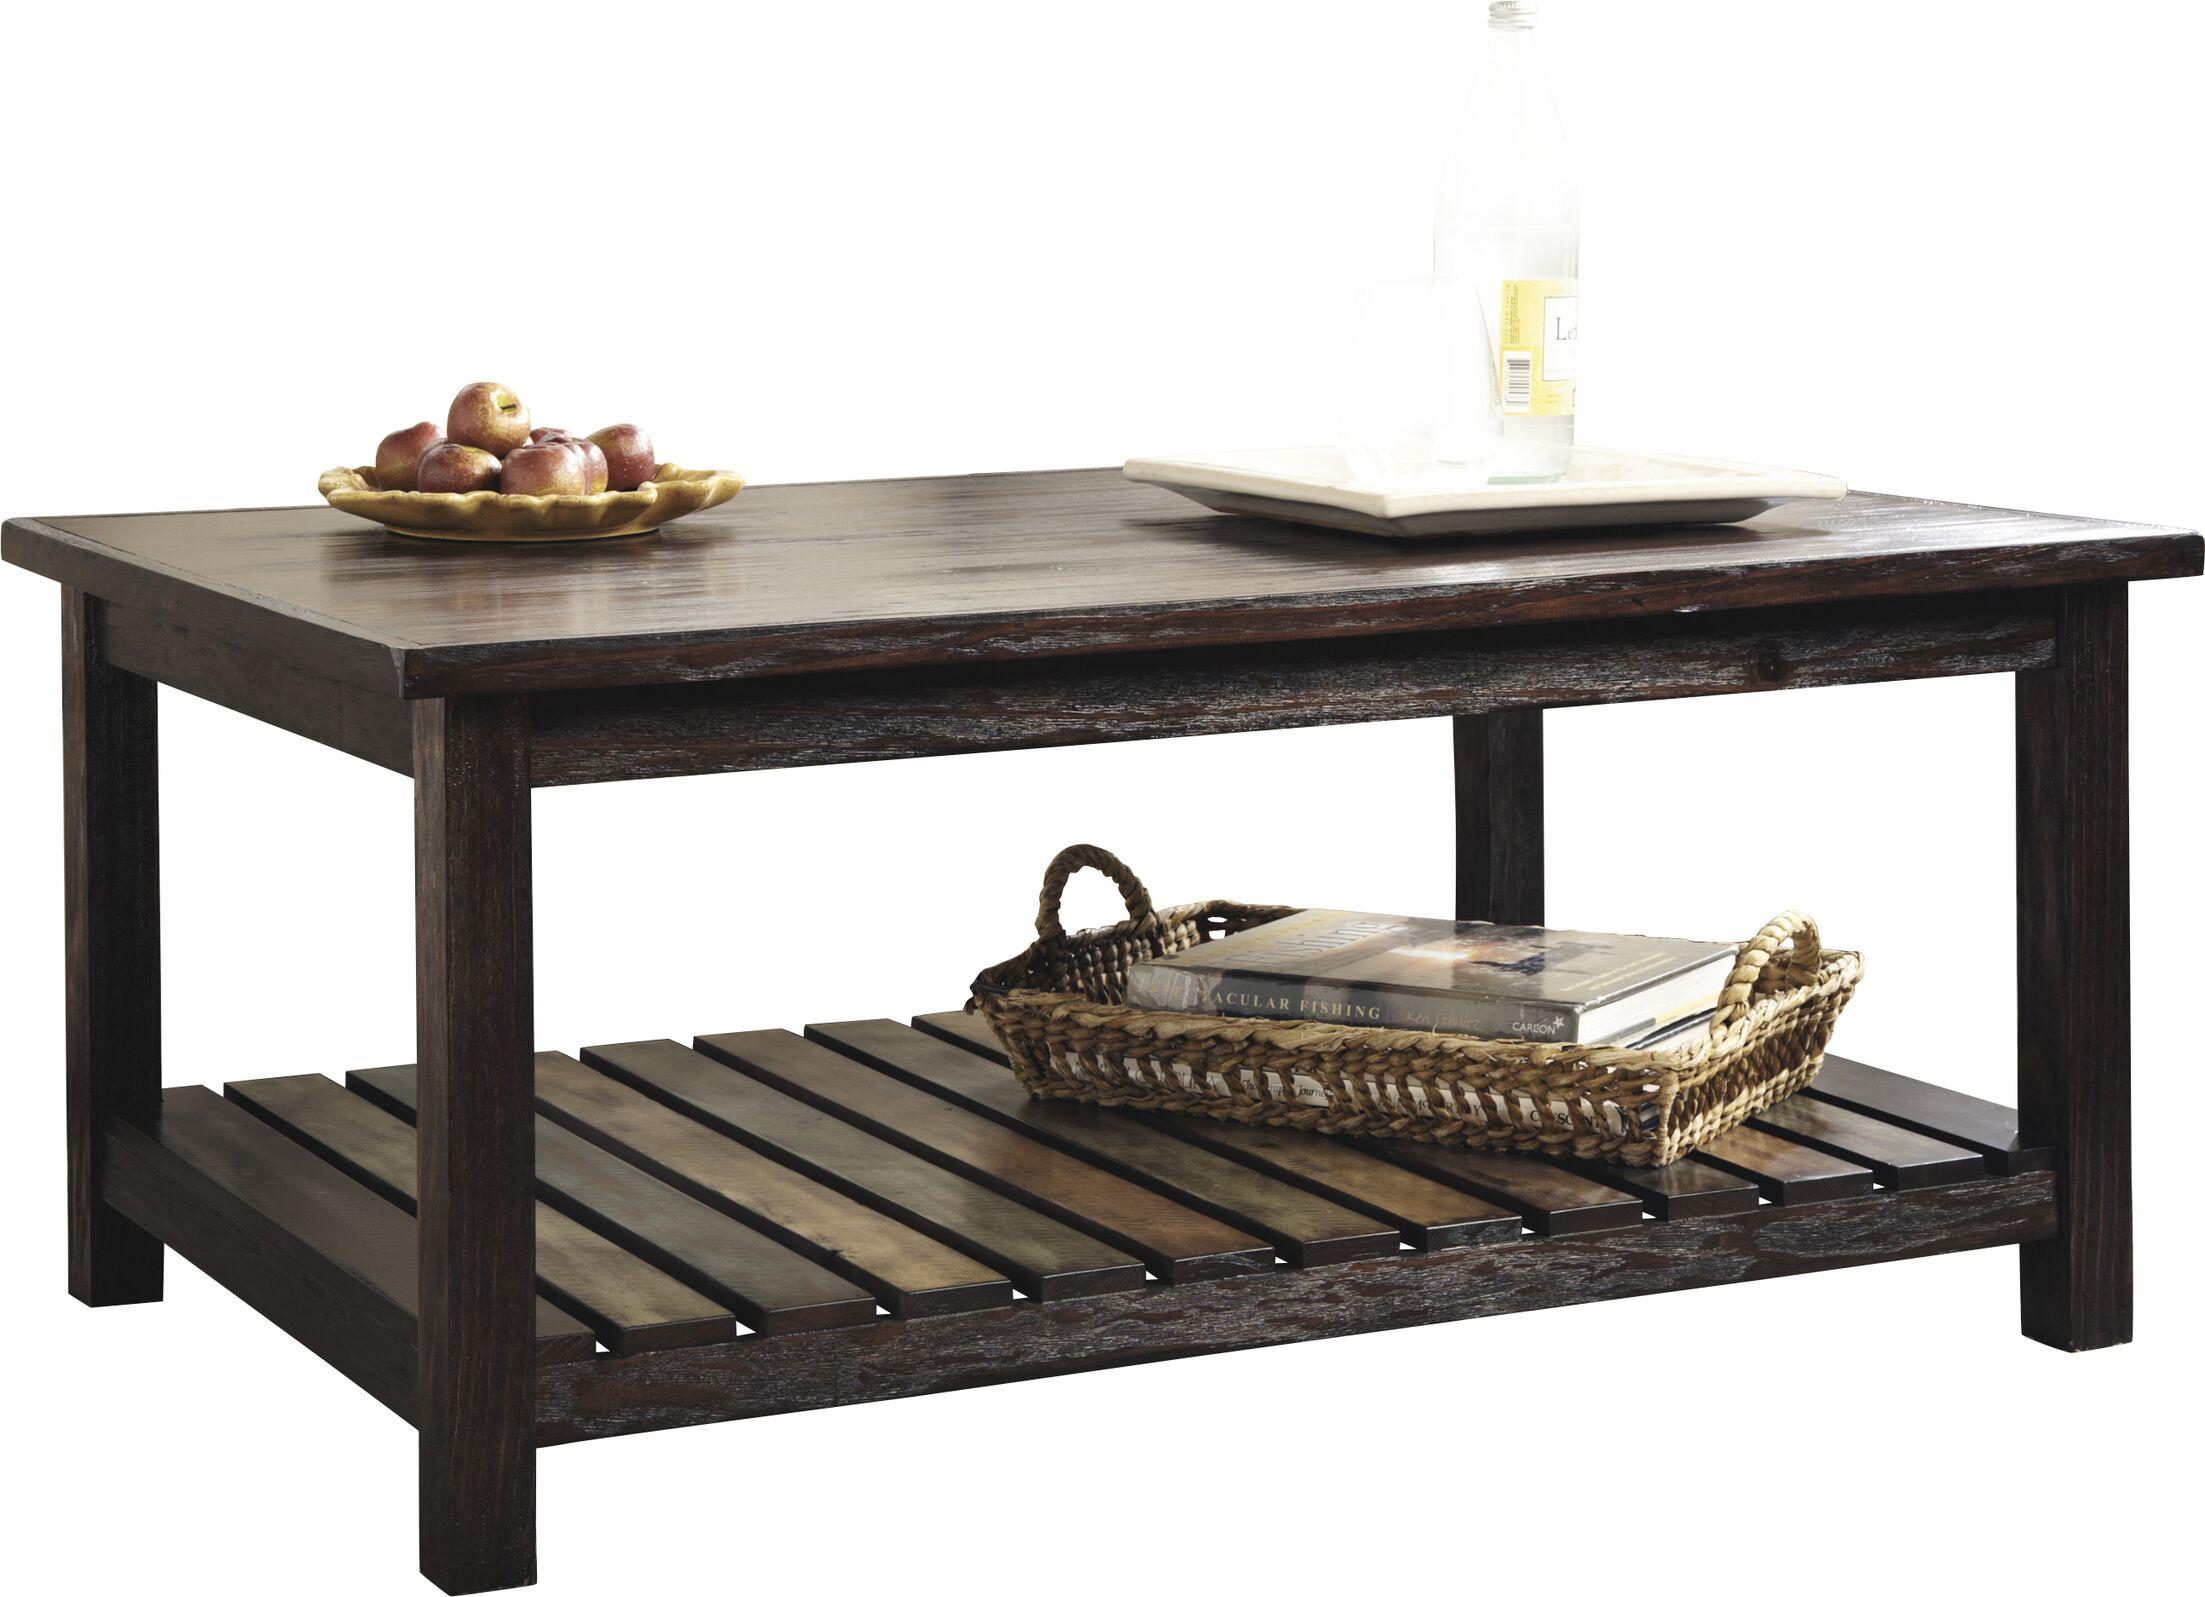 Quast Coffee Table